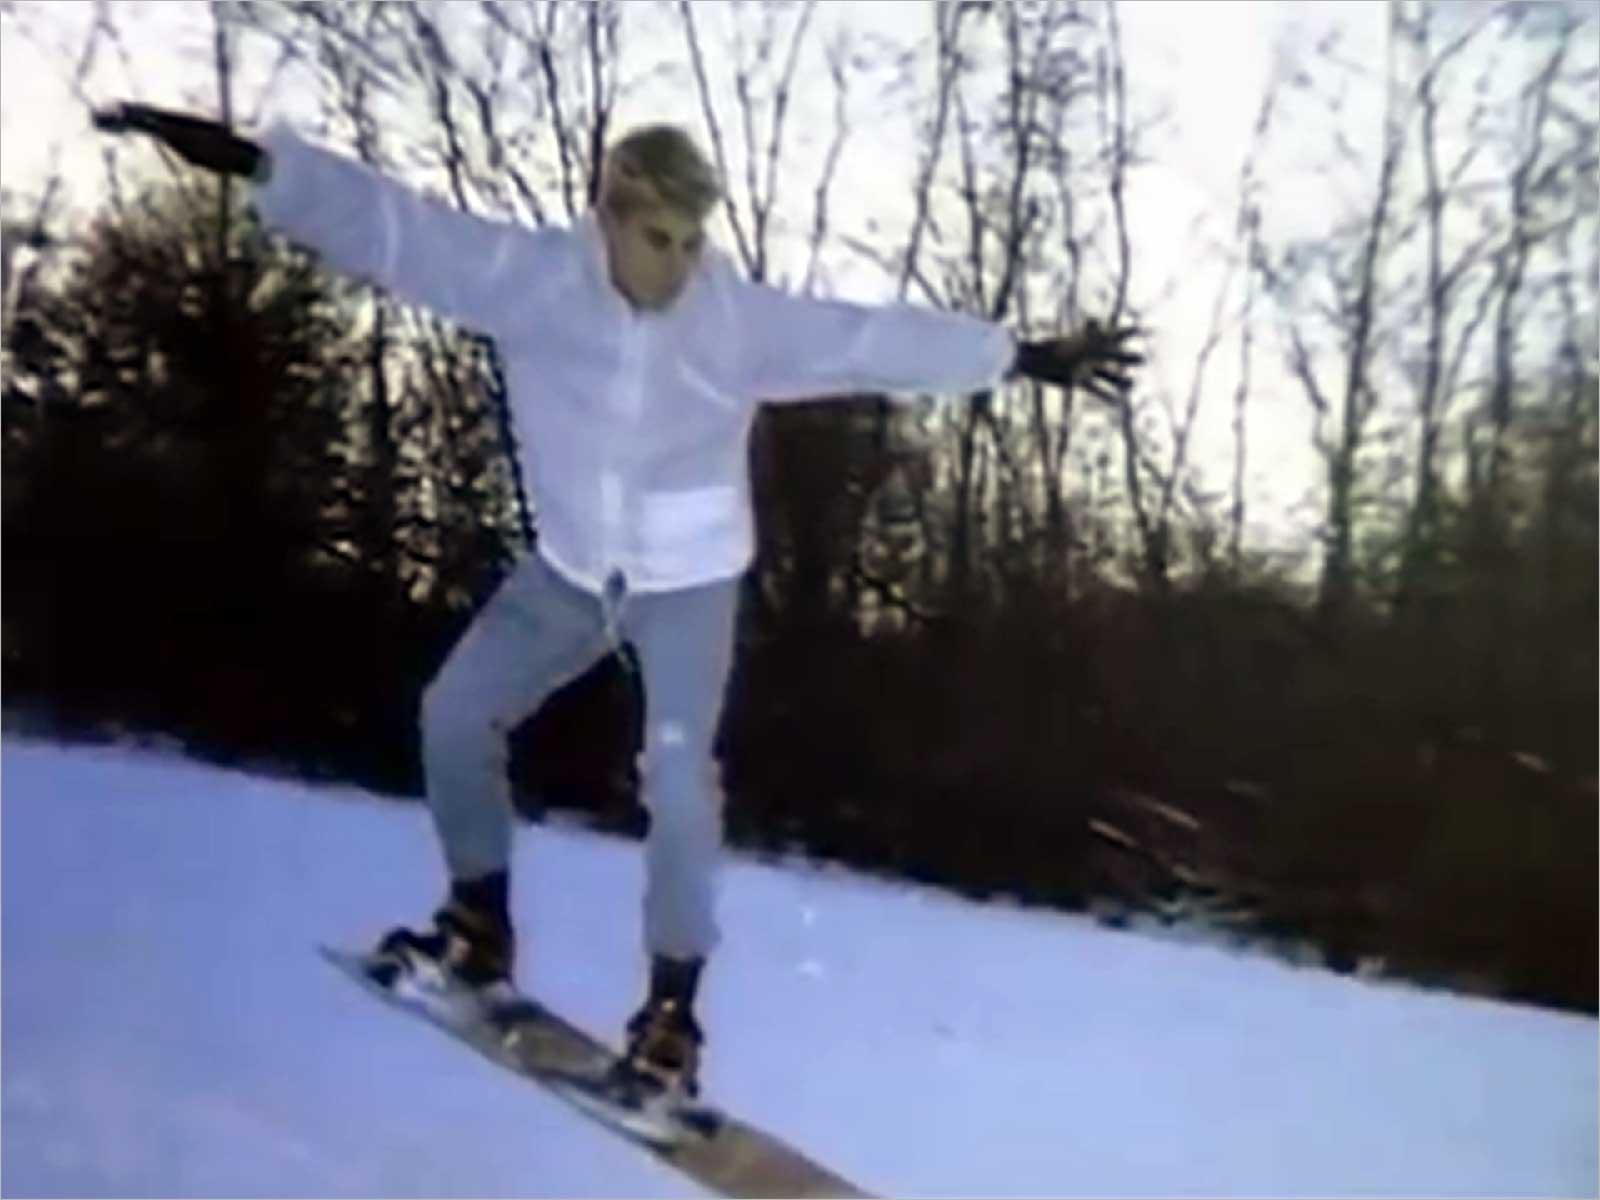 Chad Maurer snowboarding